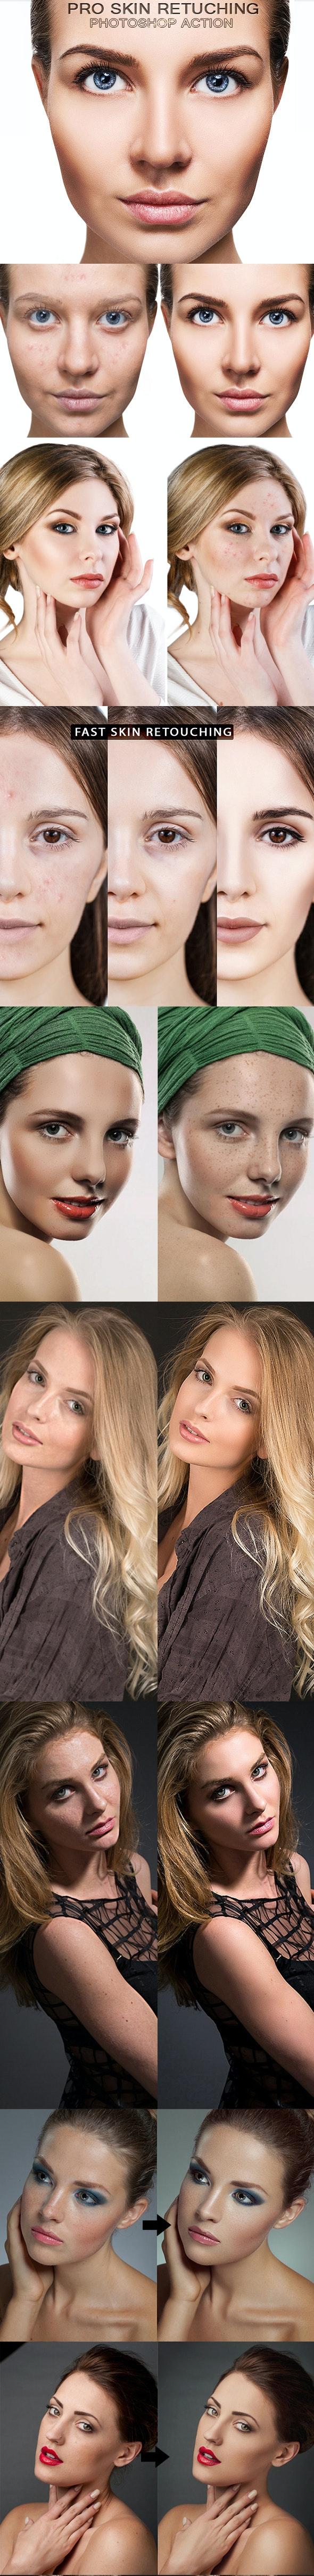 PRO Skin Retouching - Actions Photoshop